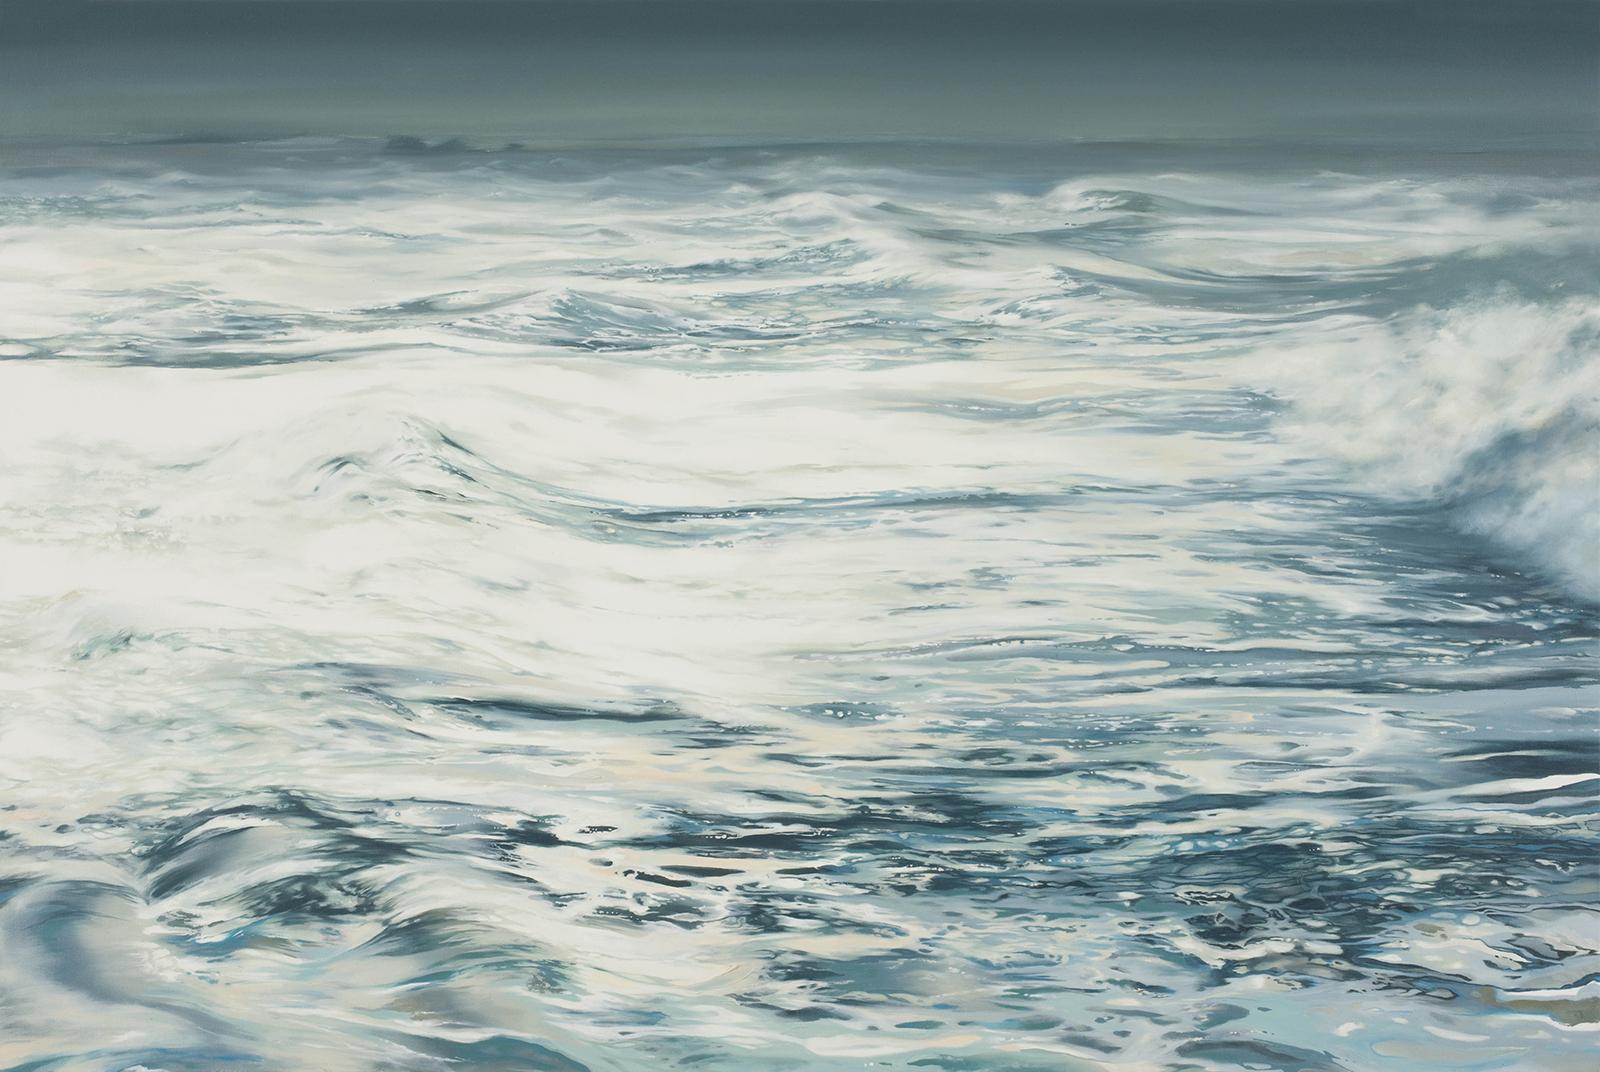 Hiddensee (Sturm) 2005, 80 x 120 cm, Öl auf Leinwand  Hiddensee (Storm) 2005, 80 x 120 cm, oil on canvas